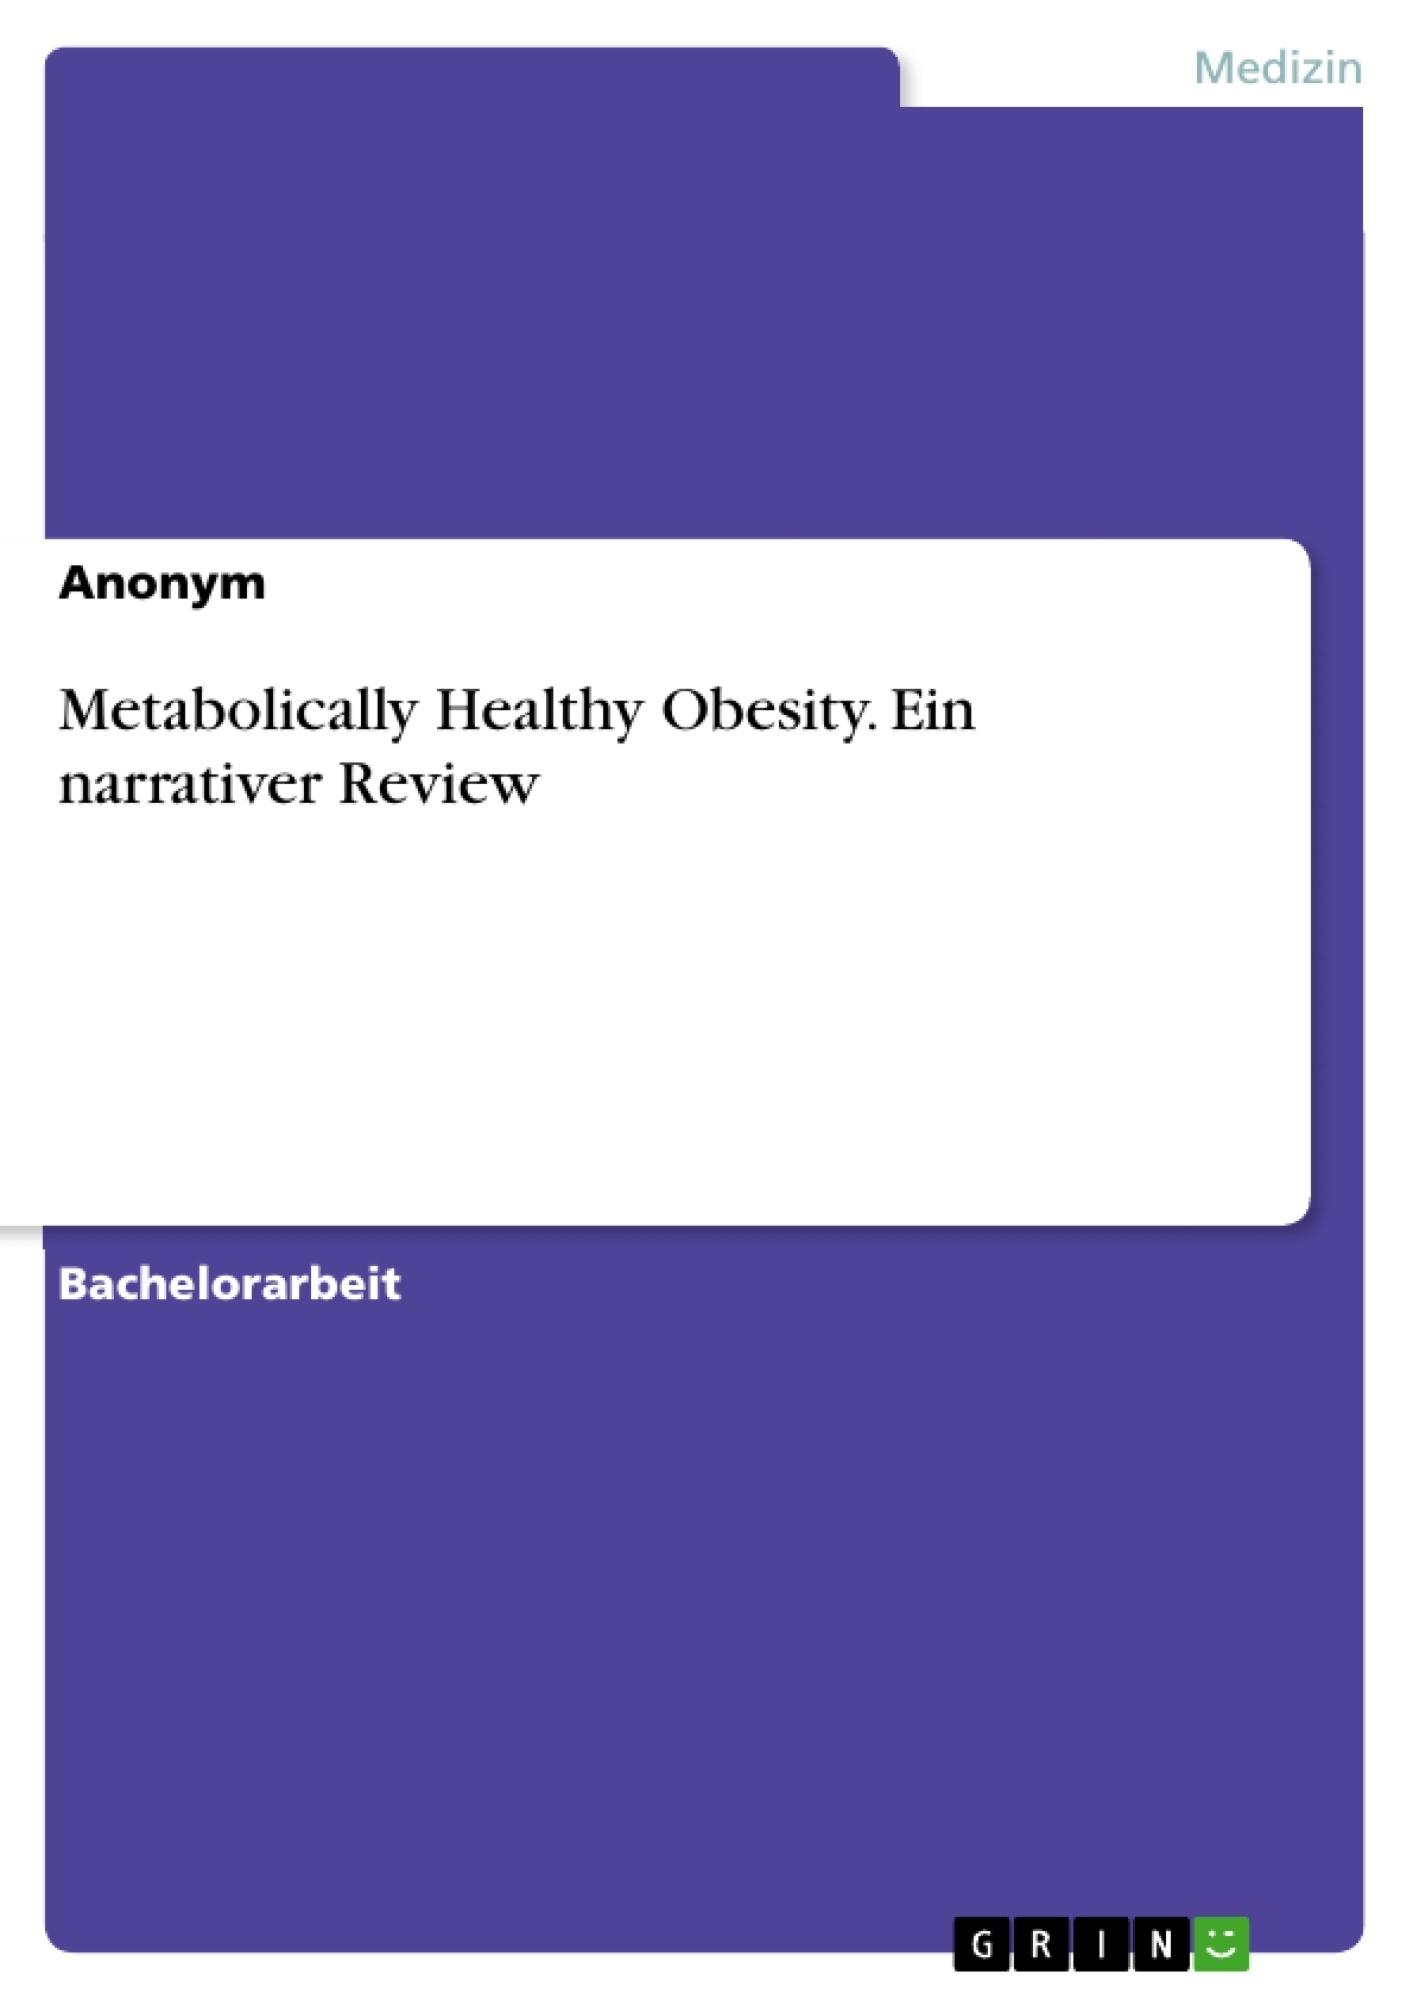 Titel: Metabolically Healthy Obesity. Ein narrativer Review